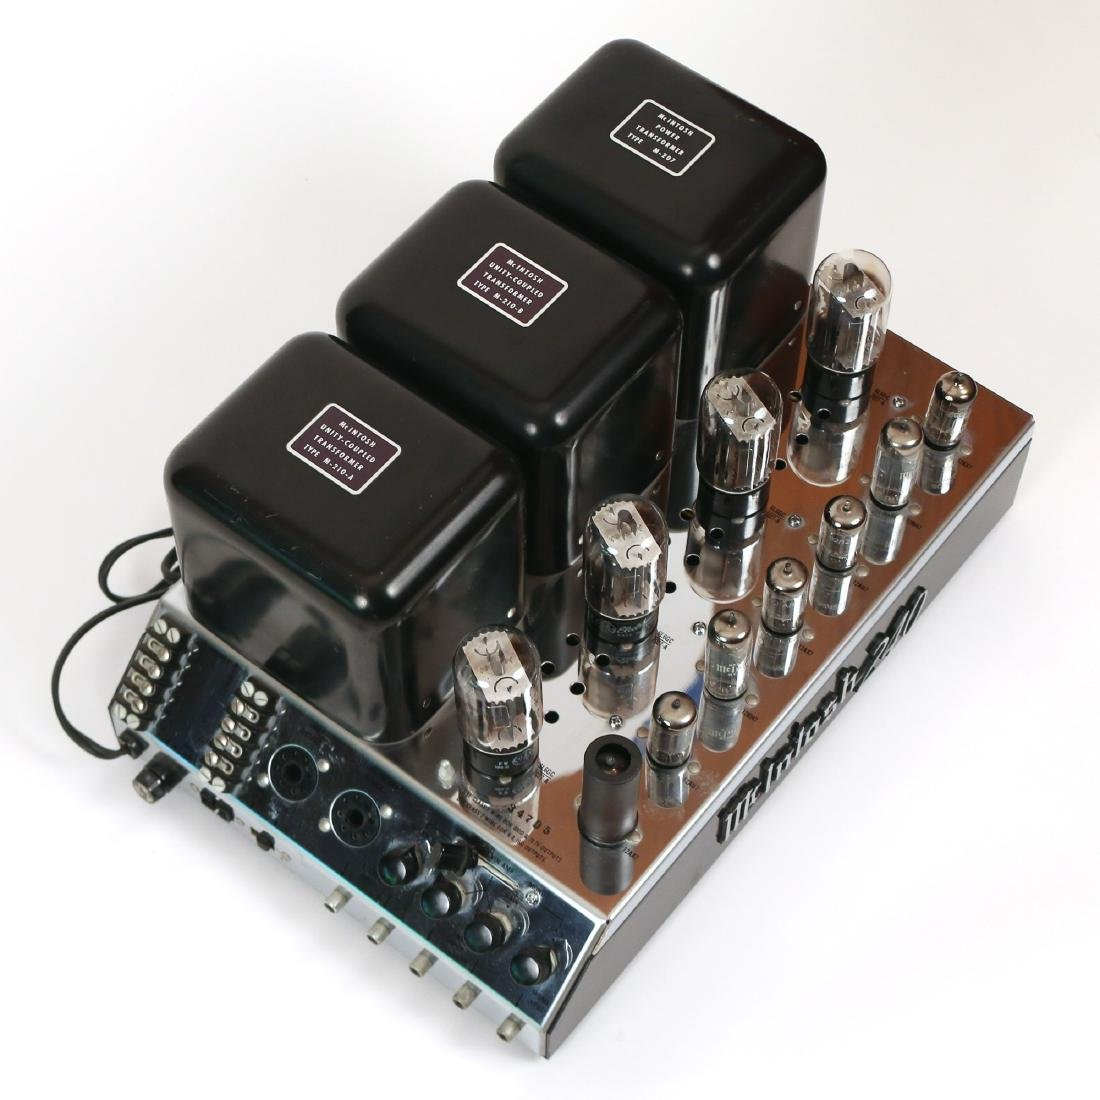 McINTOSH MODEL MC240 STEREO AMPLIFIER - 3